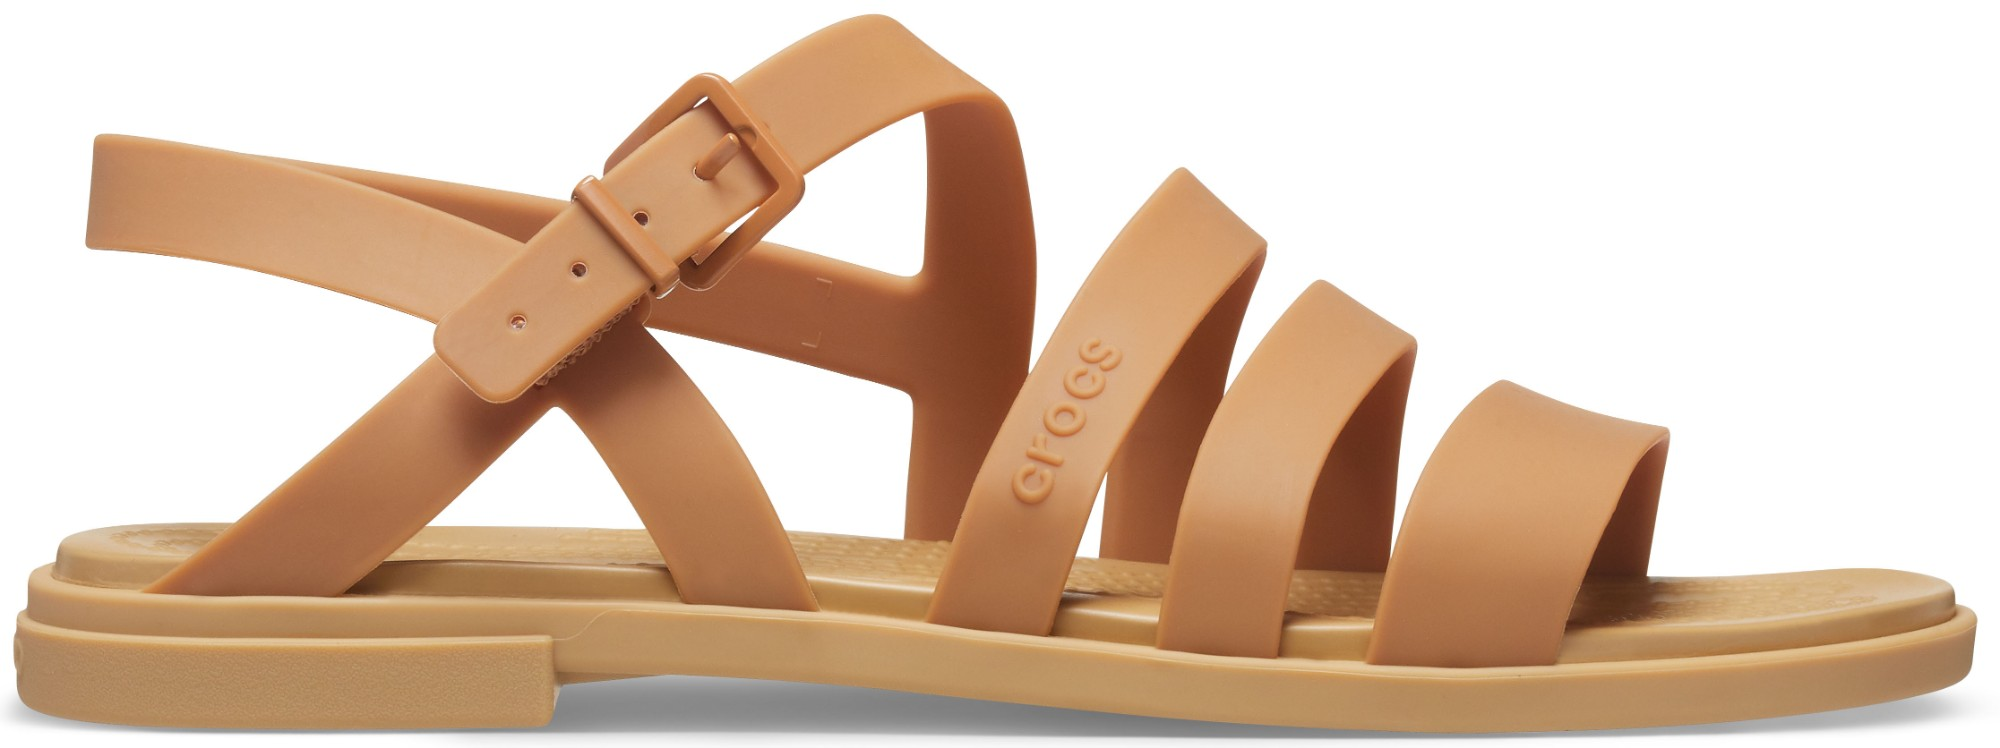 Crocs™ Tulum Sandal Womens Dark Gold 39,5